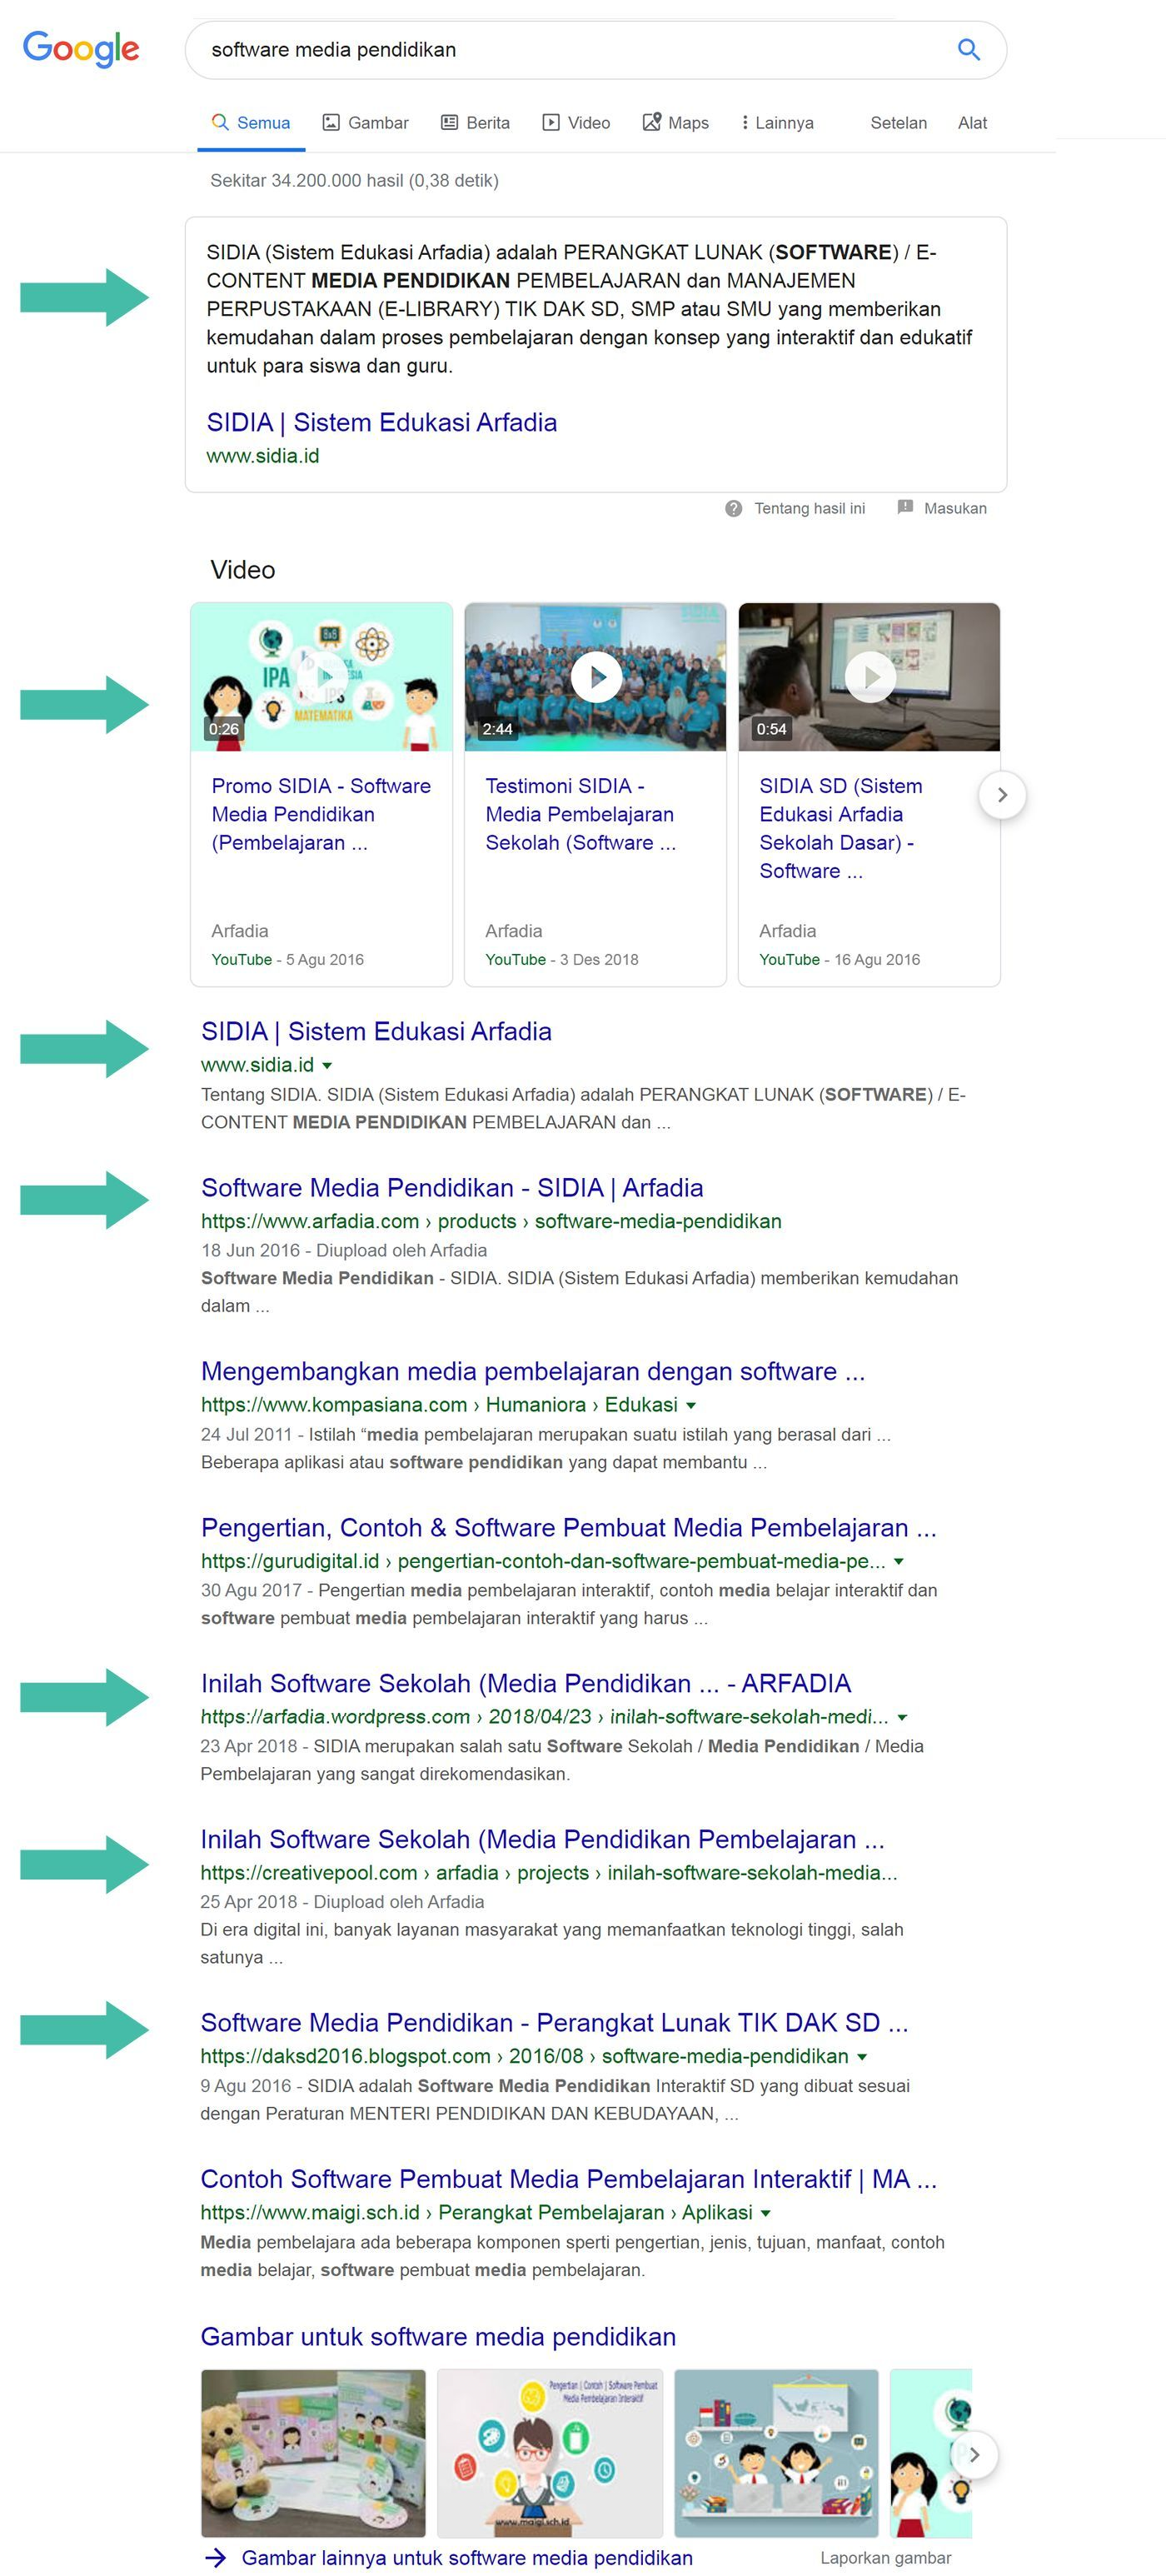 Dominasi Google - Jasa SEO Profesional - Arfadia